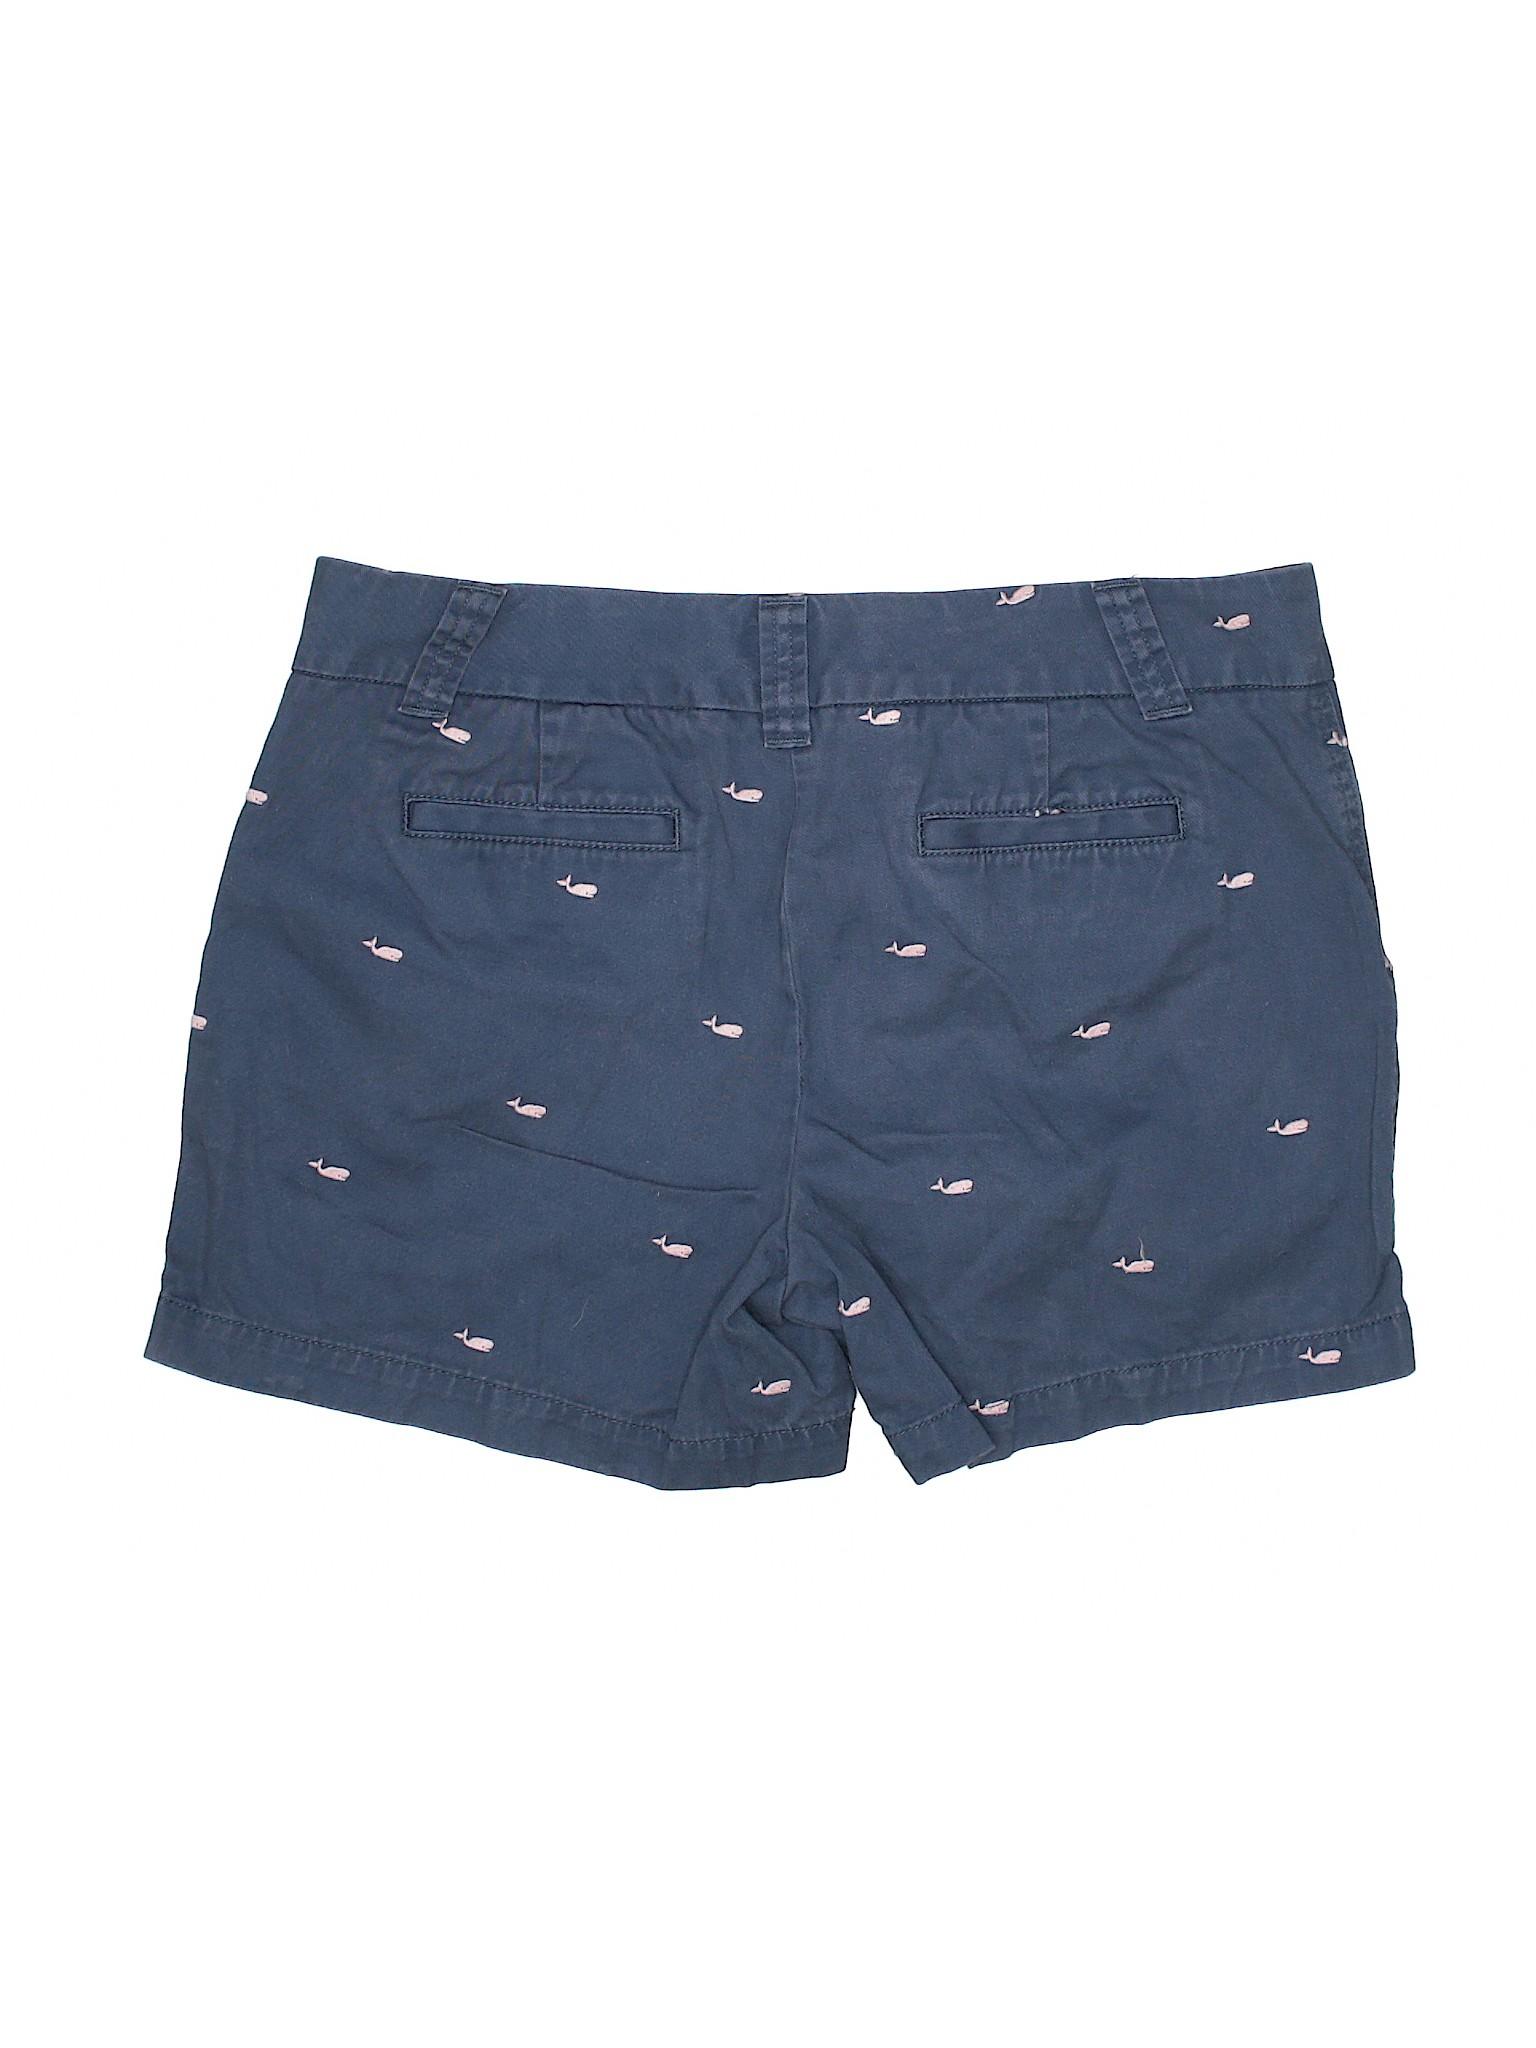 Khaki Factory J Boutique Crew Shorts Store qI6wgwH